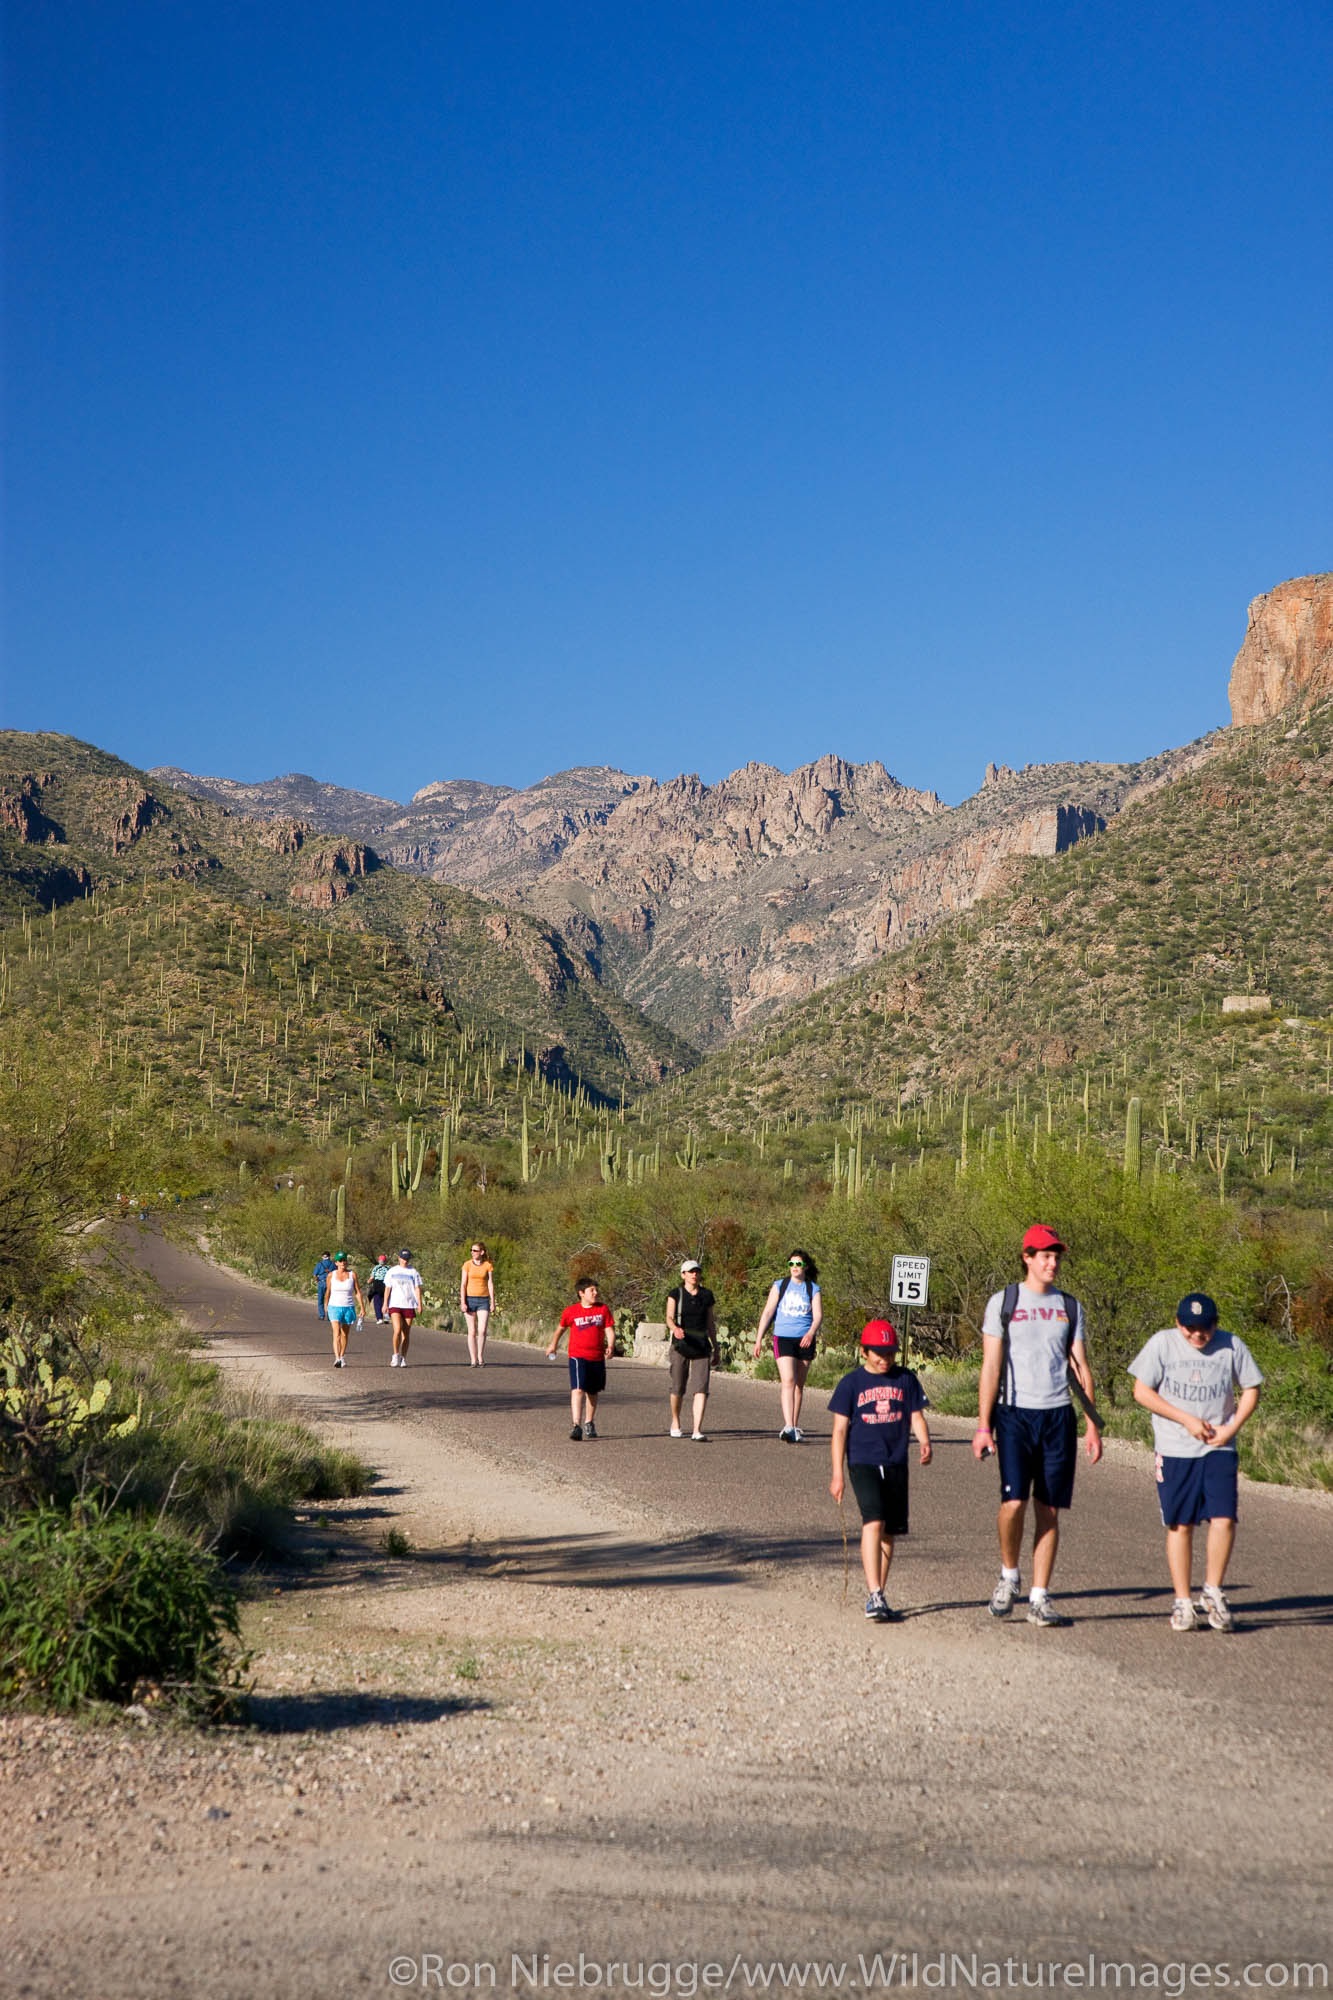 Hikers in Sabino Canyon Recreation Area, Tucson, Arizona.